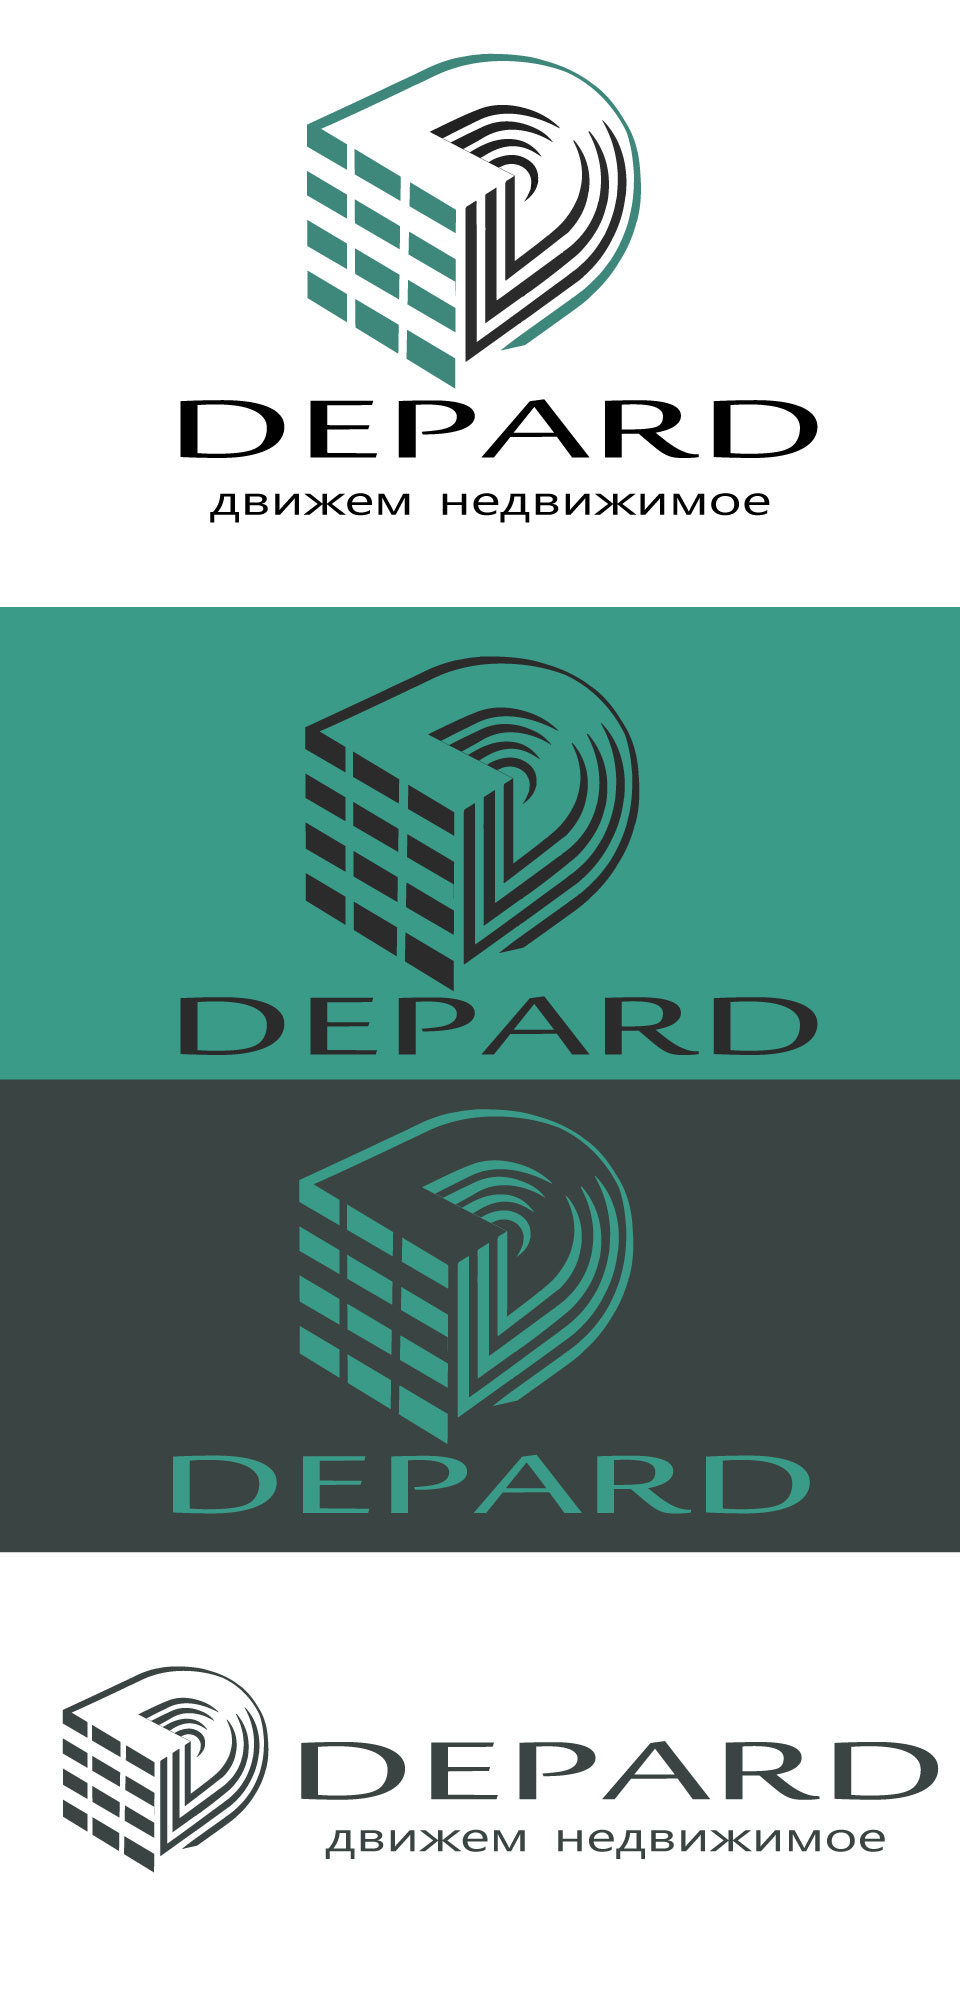 Логотип для компании (услуги недвижимость) фото f_5835933fce70e926.jpg